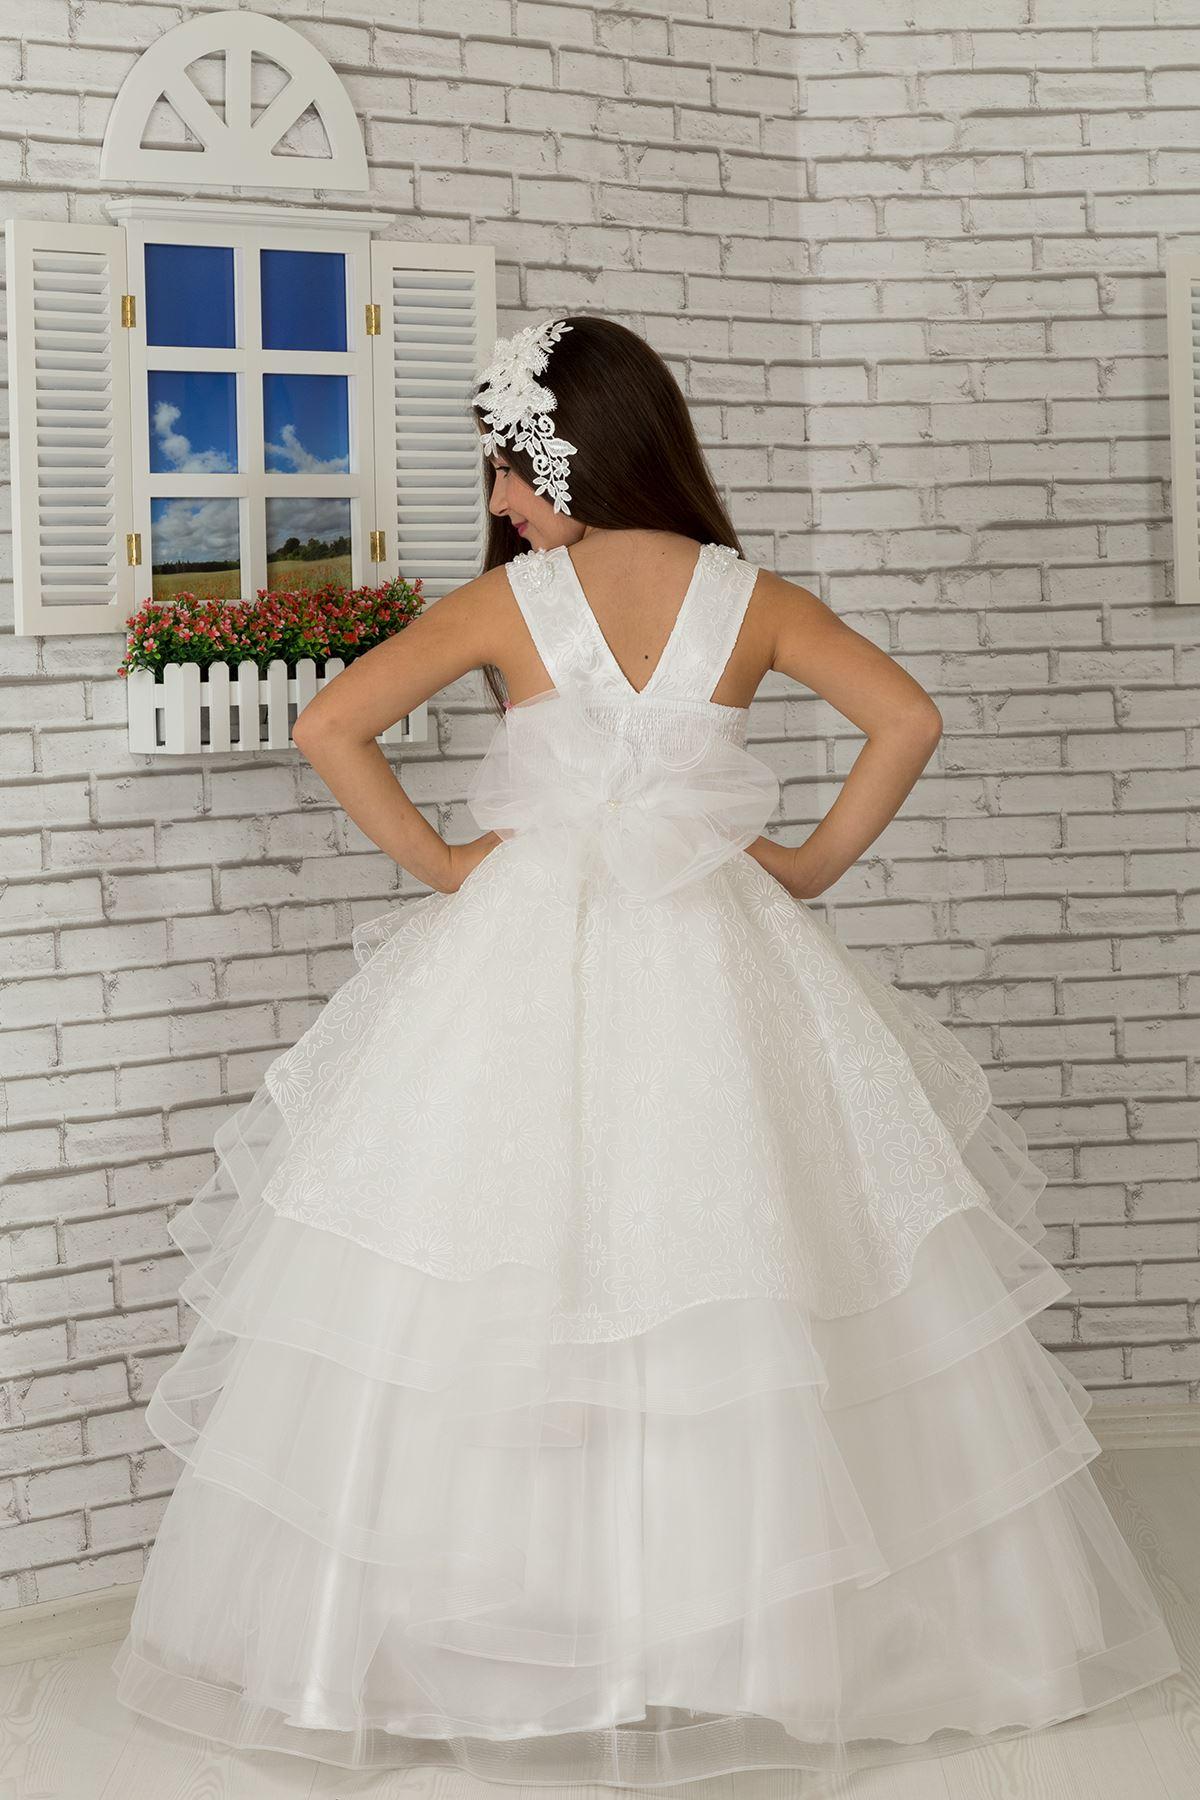 Тяло бродирано, талия подробно пухкаво момиче деца вечерна рокля 626 крем